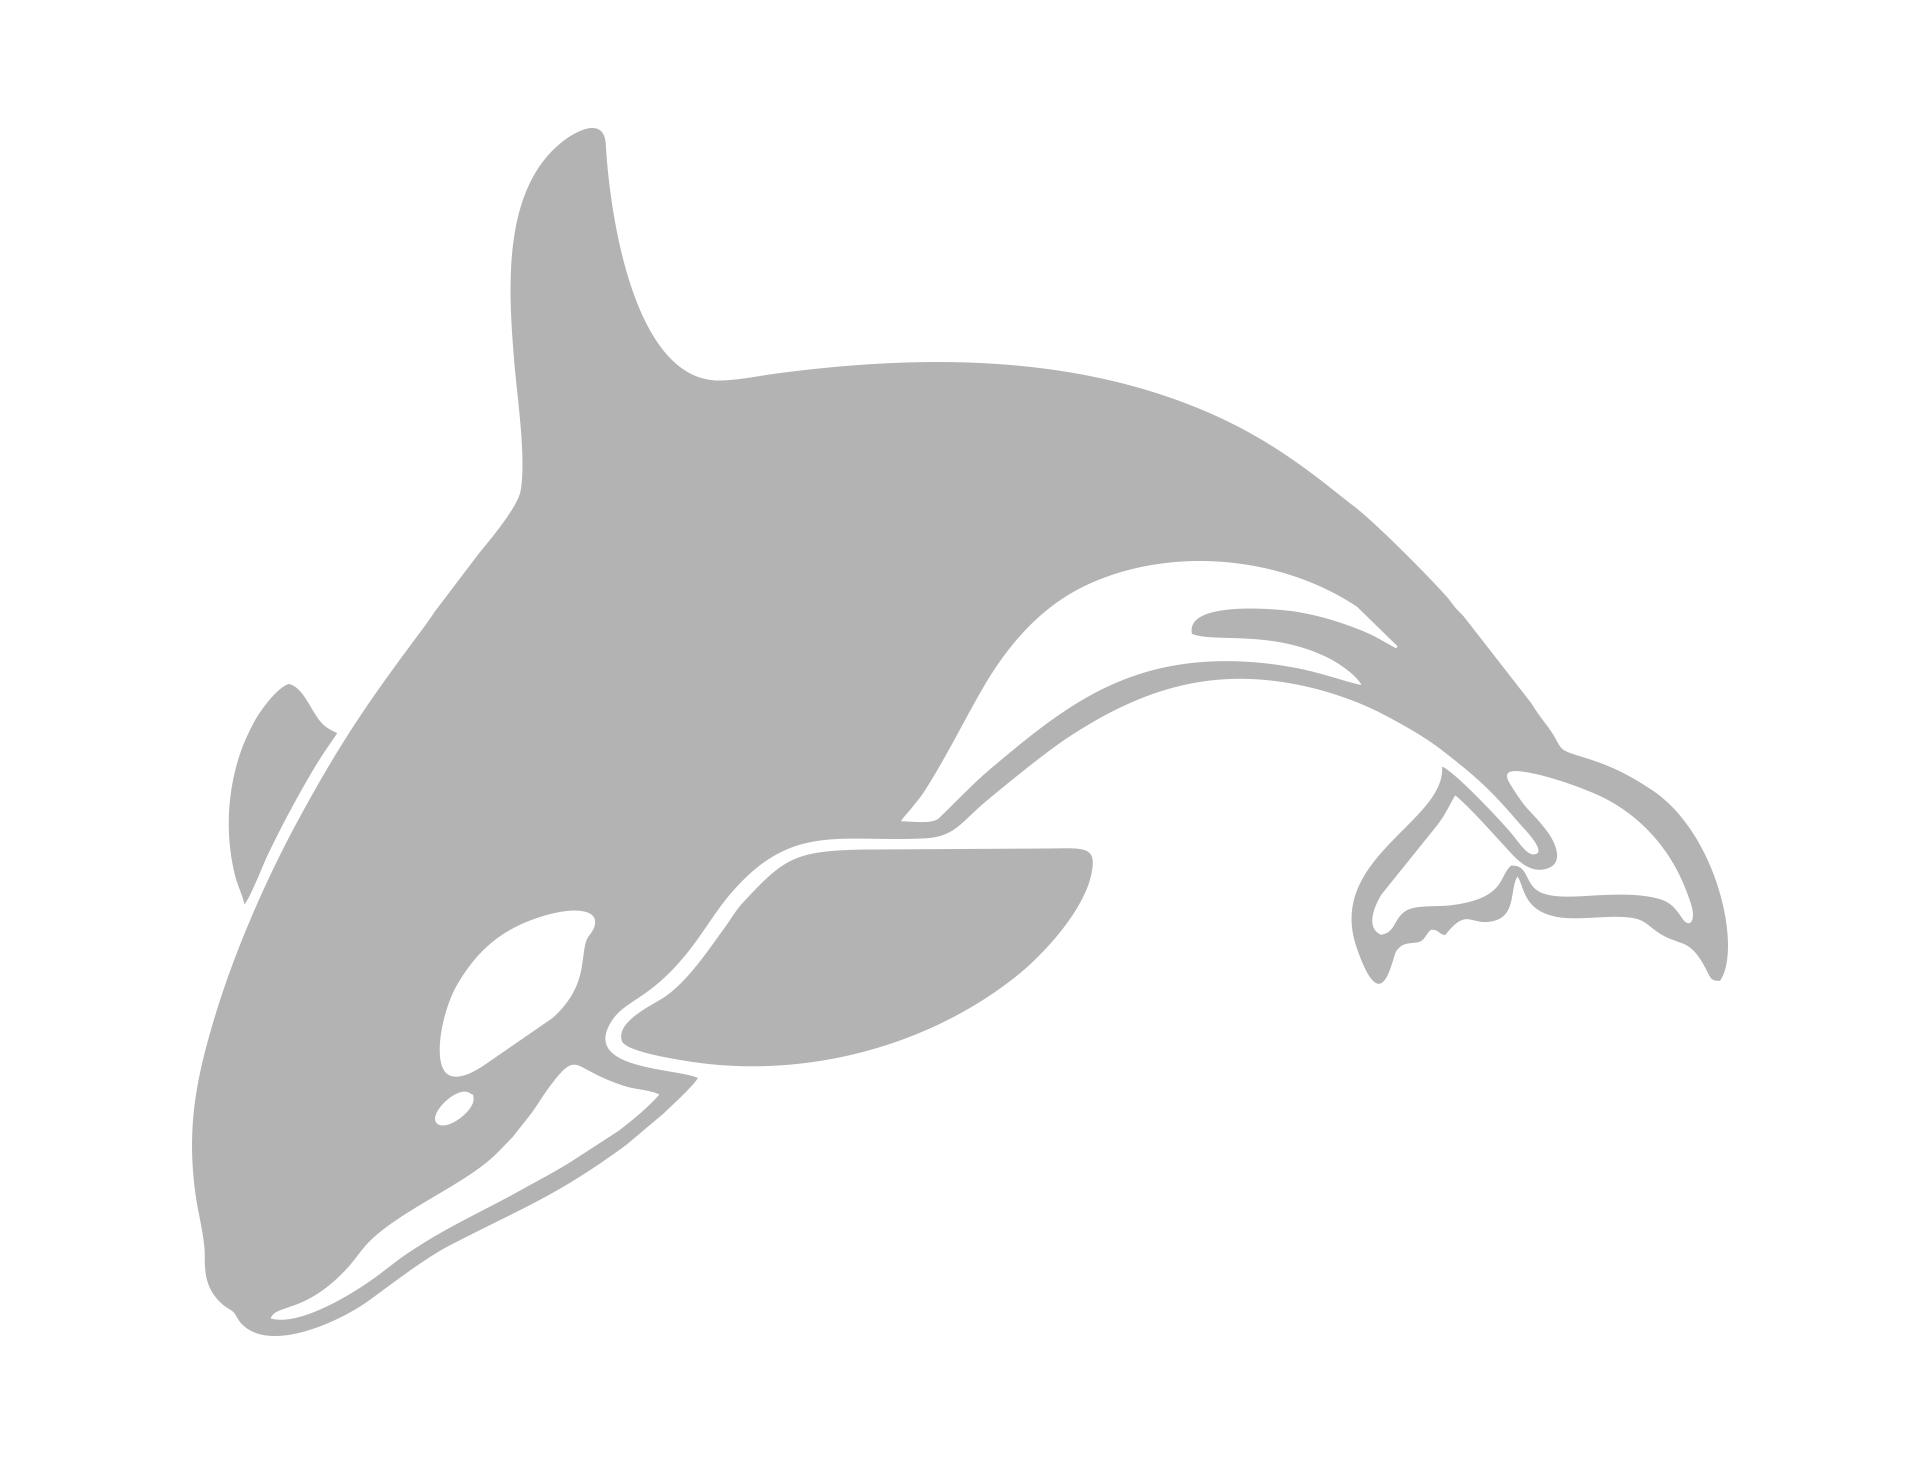 Orca Killer Whale Stencil